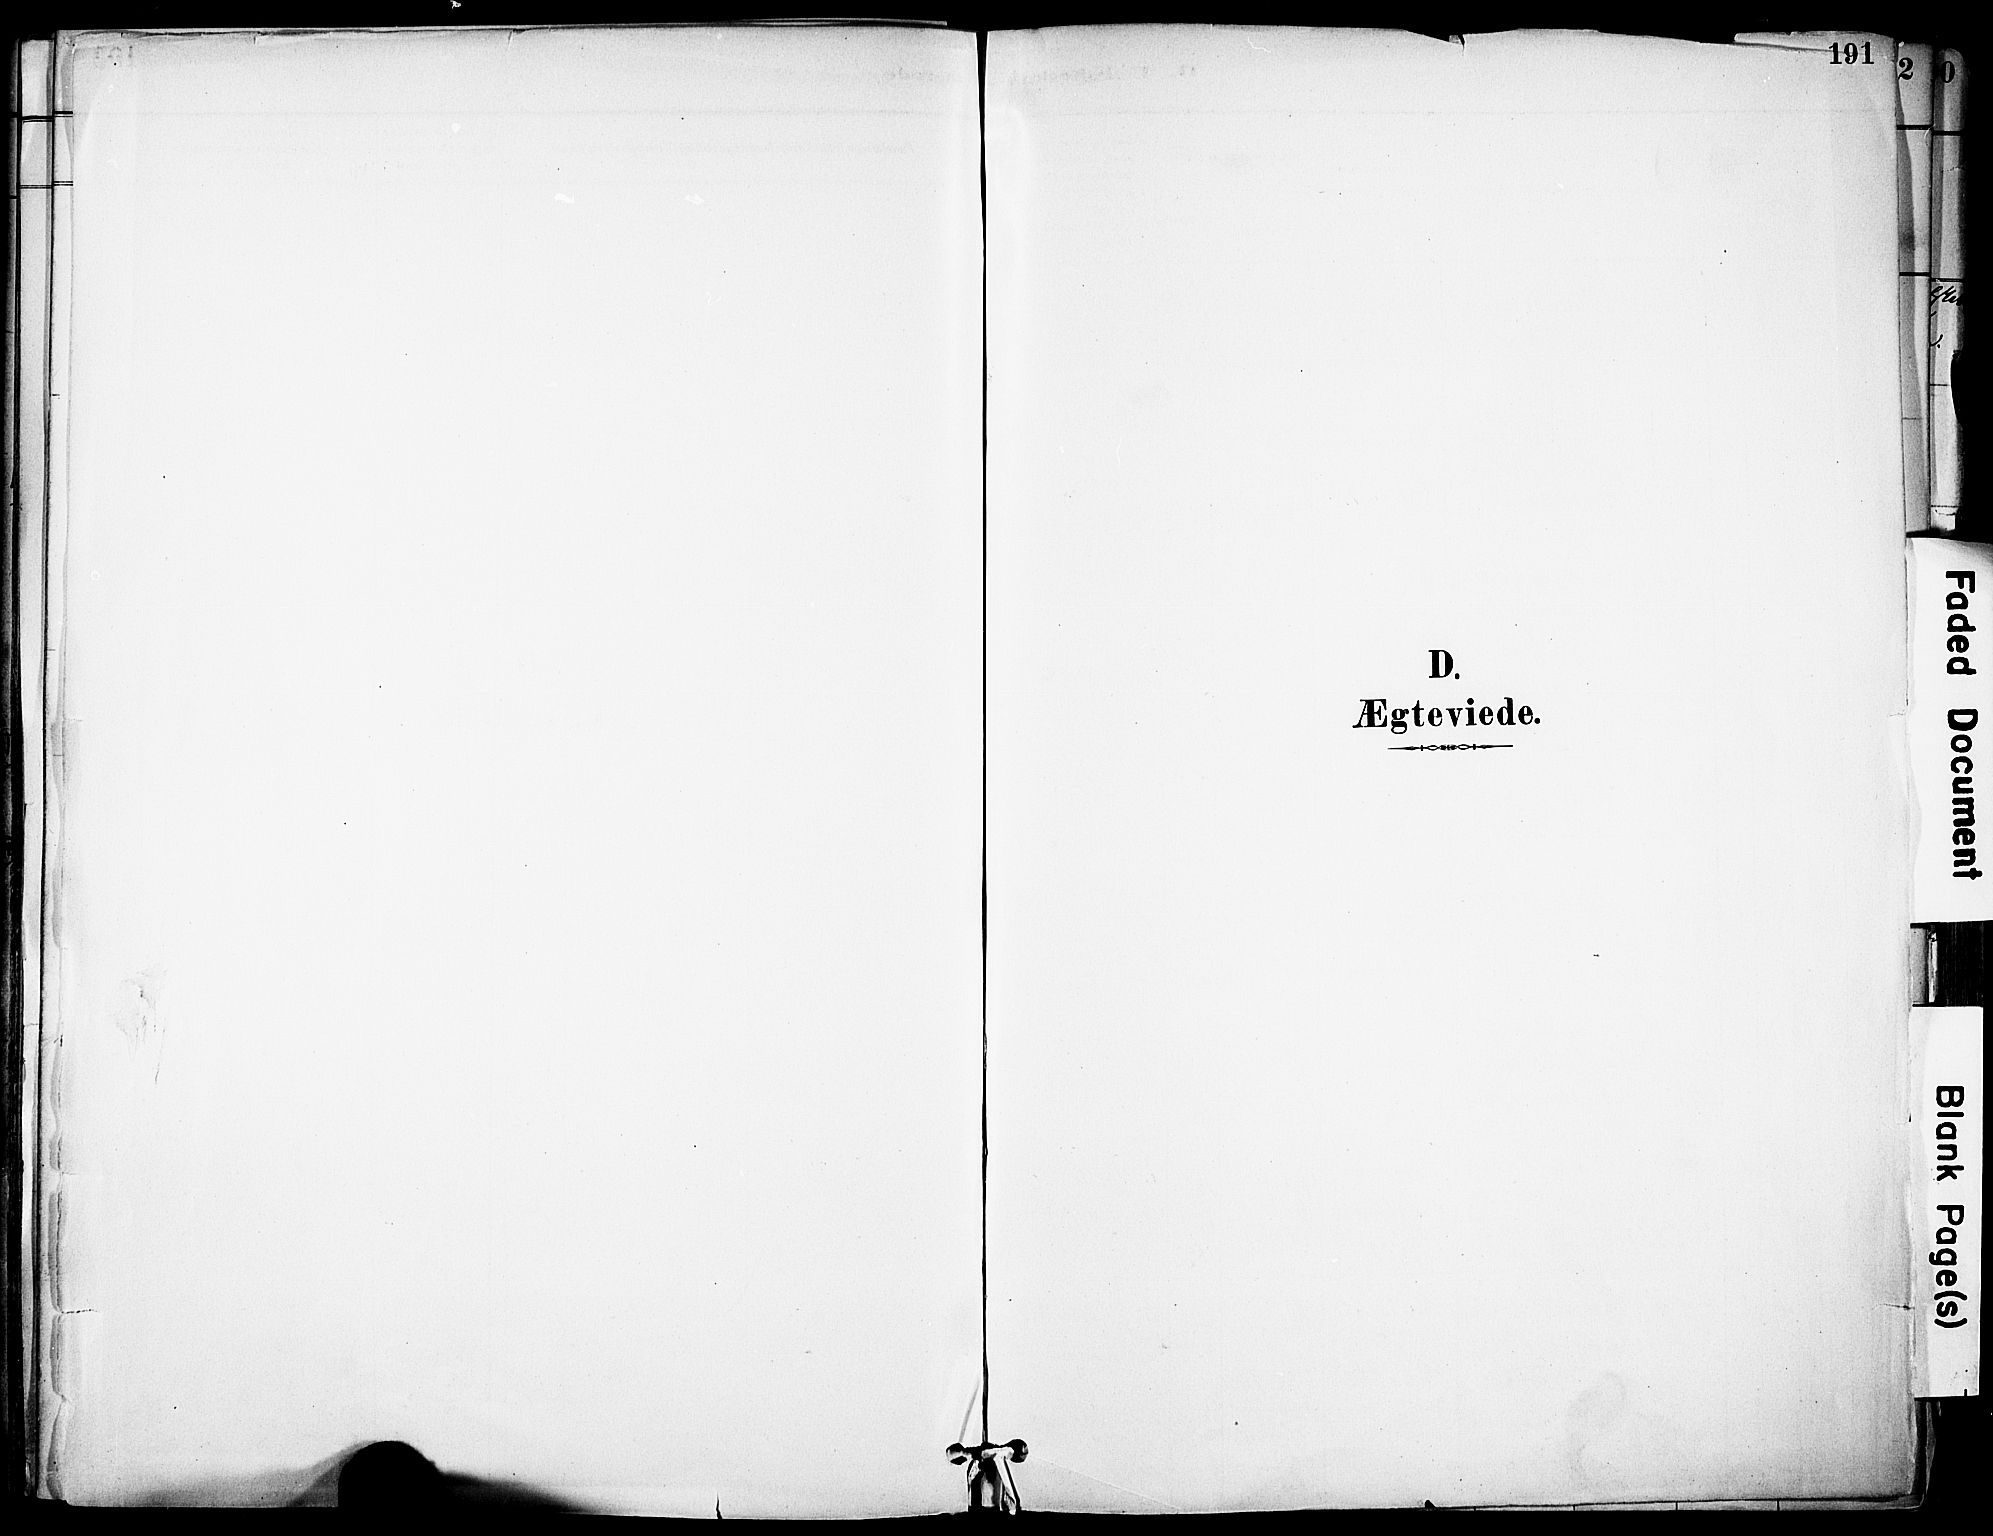 SAKO, Solum kirkebøker, F/Fa/L0010: Ministerialbok nr. I 10, 1888-1898, s. 191